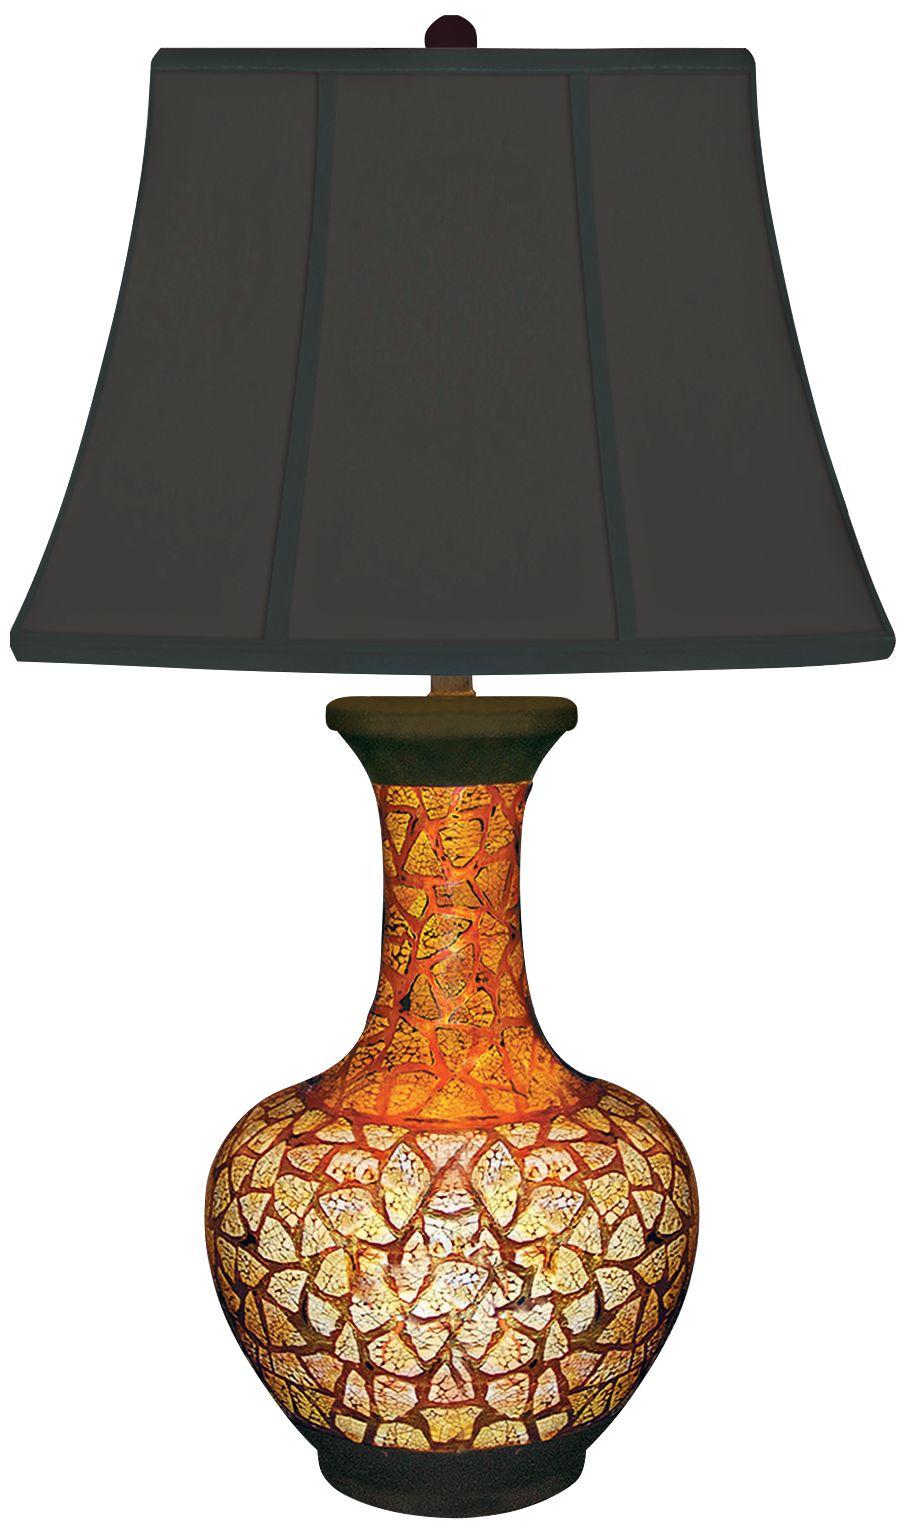 Eggshell Red And Black Porcelain Urn Table Lamp